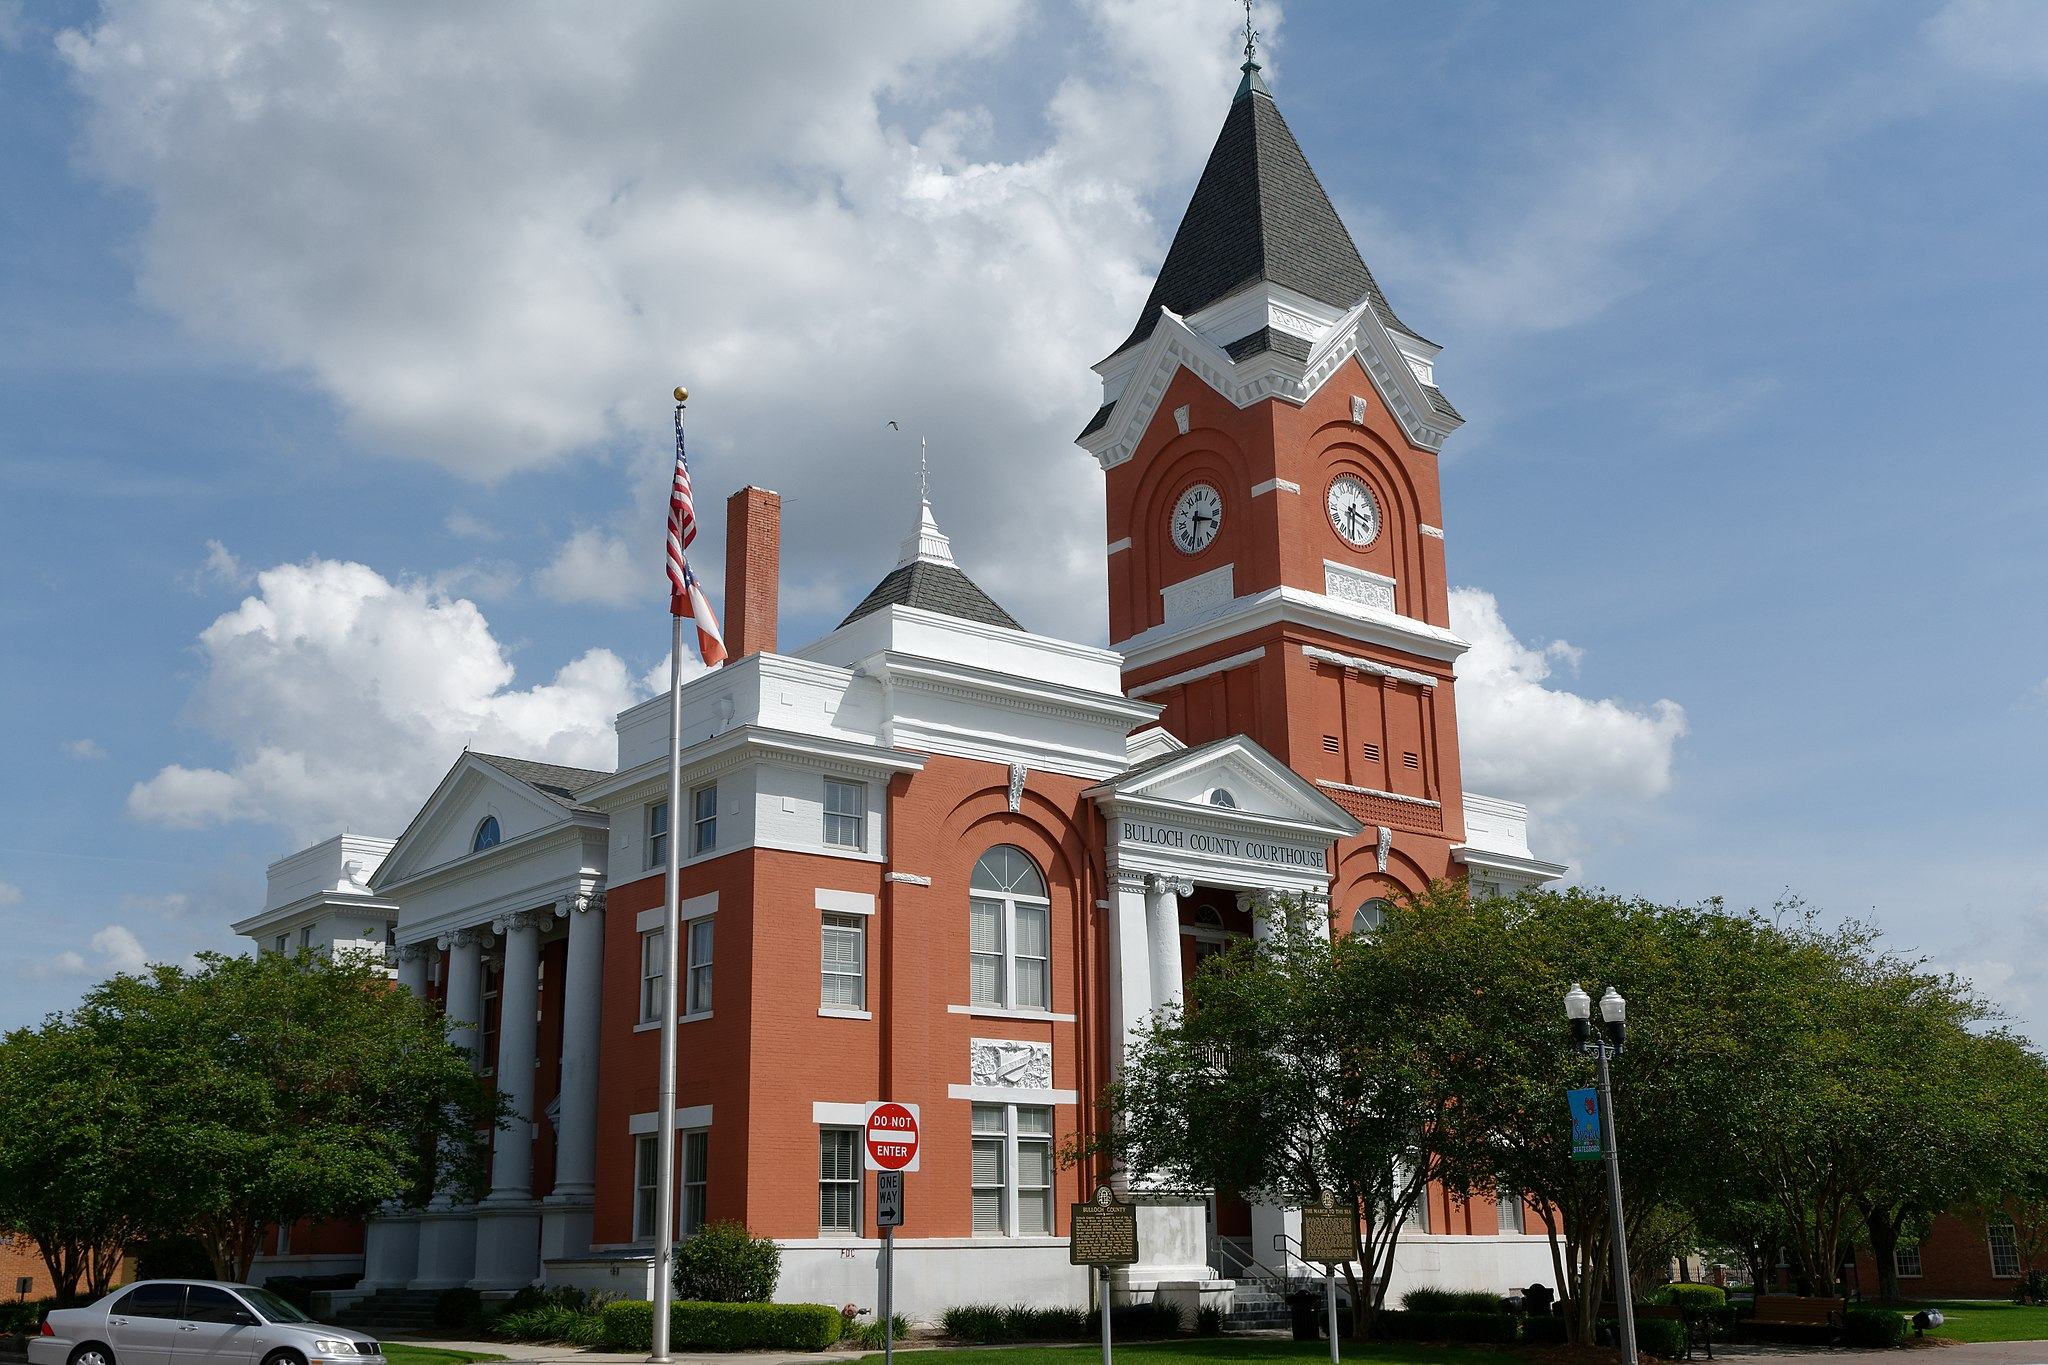 Bulloch County Courthouse, Statesboro, GA, US